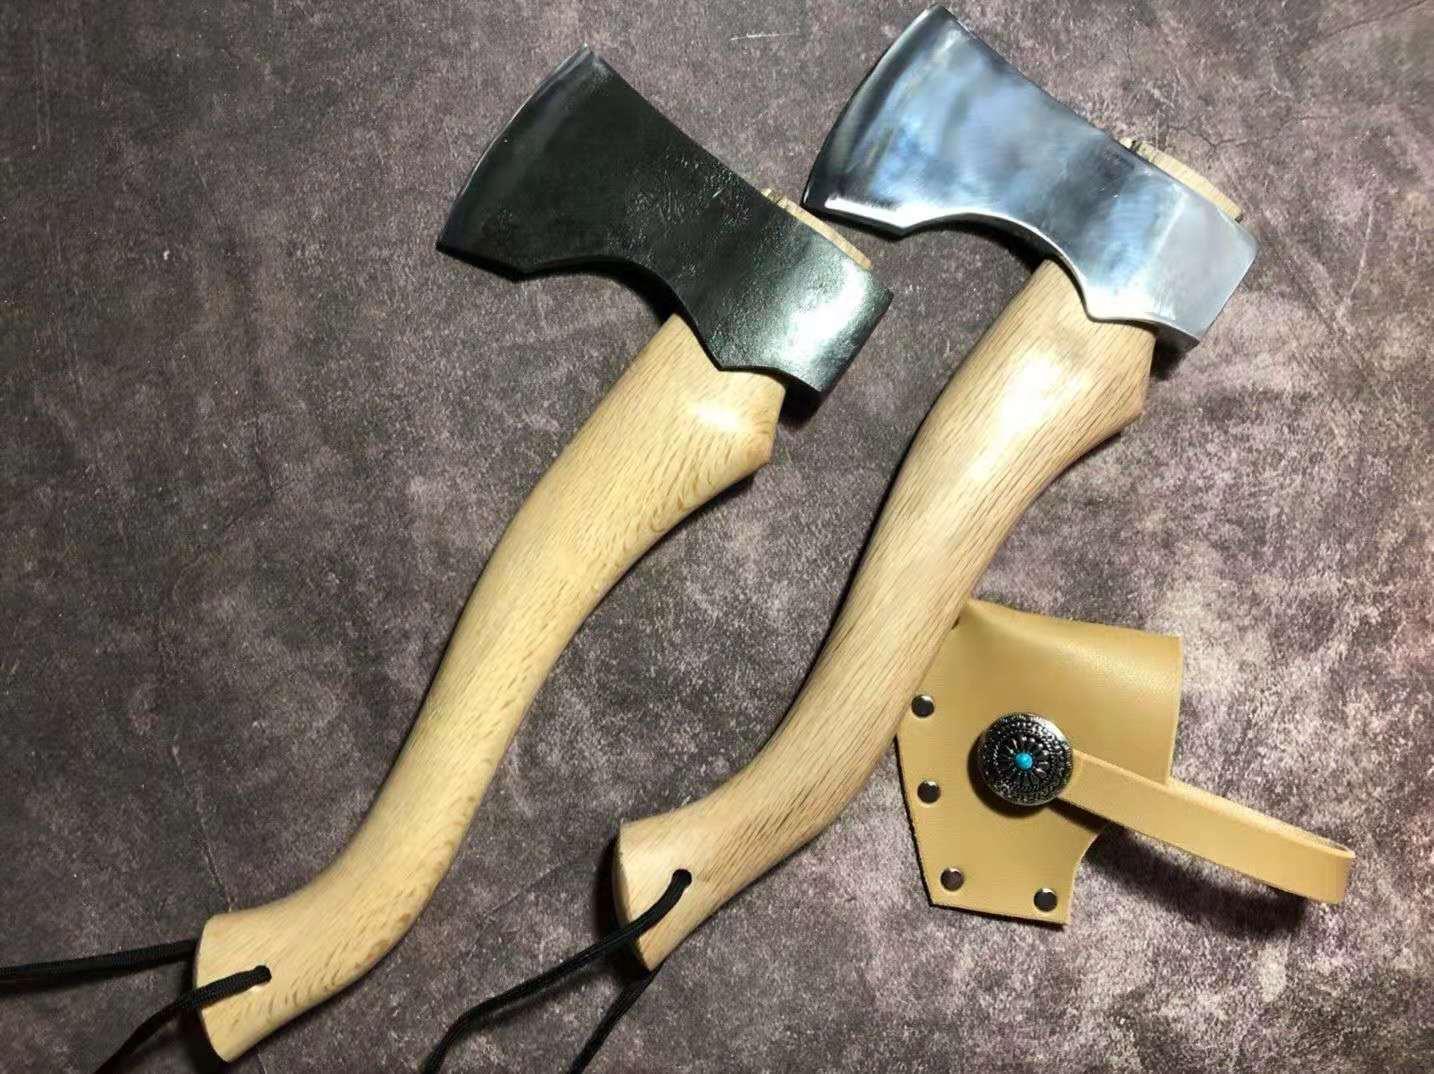 Hand-forged Outdoor Axe Nieman Hand Axe Fosviking Camping Town Homestead Chopping Bone Gift Self-defense Jungle Axe